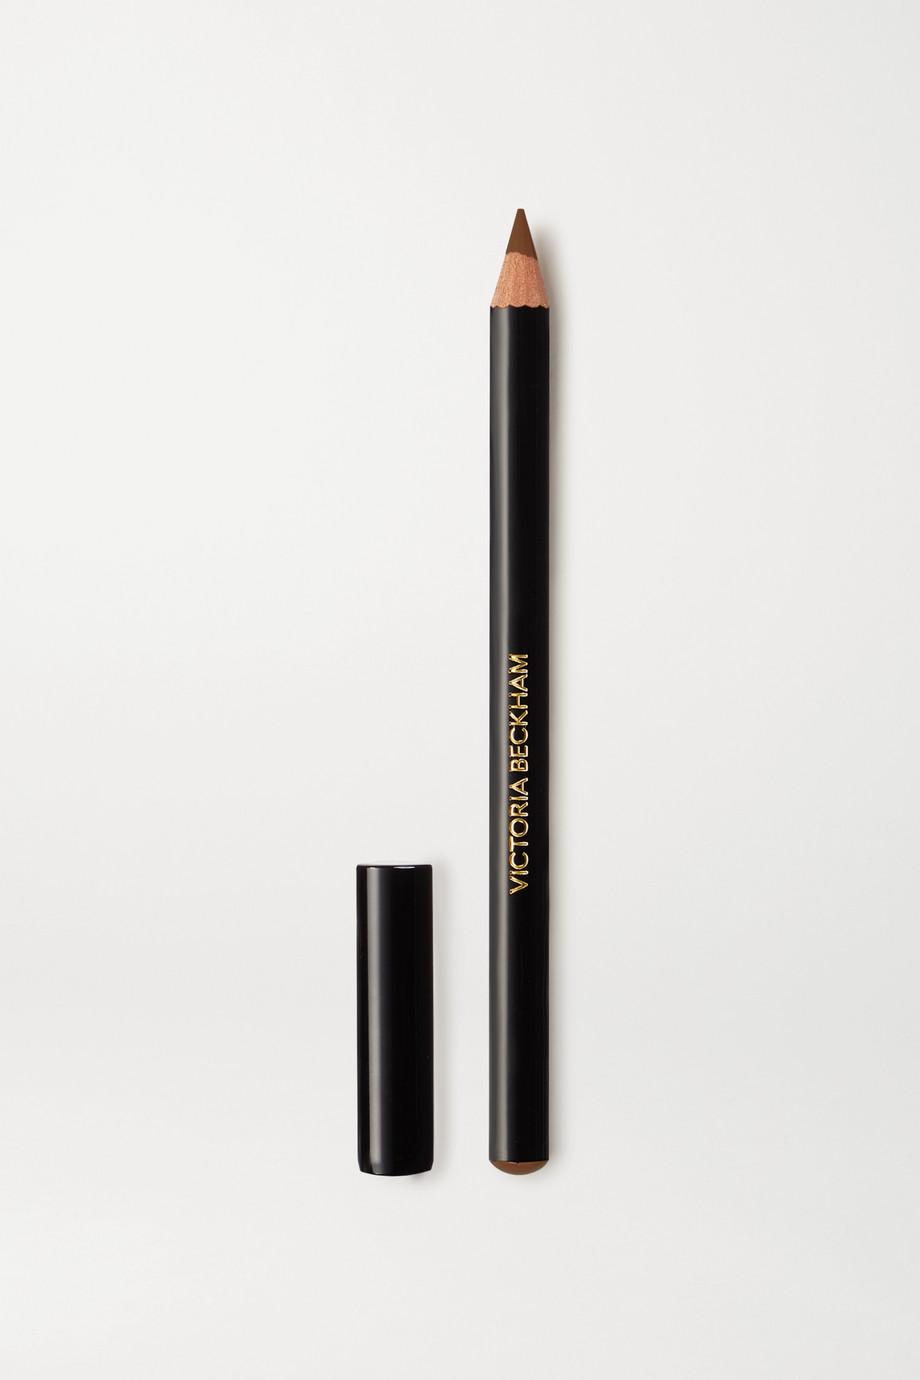 Victoria Beckham Beauty Lip Definer – 05 – Lipliner